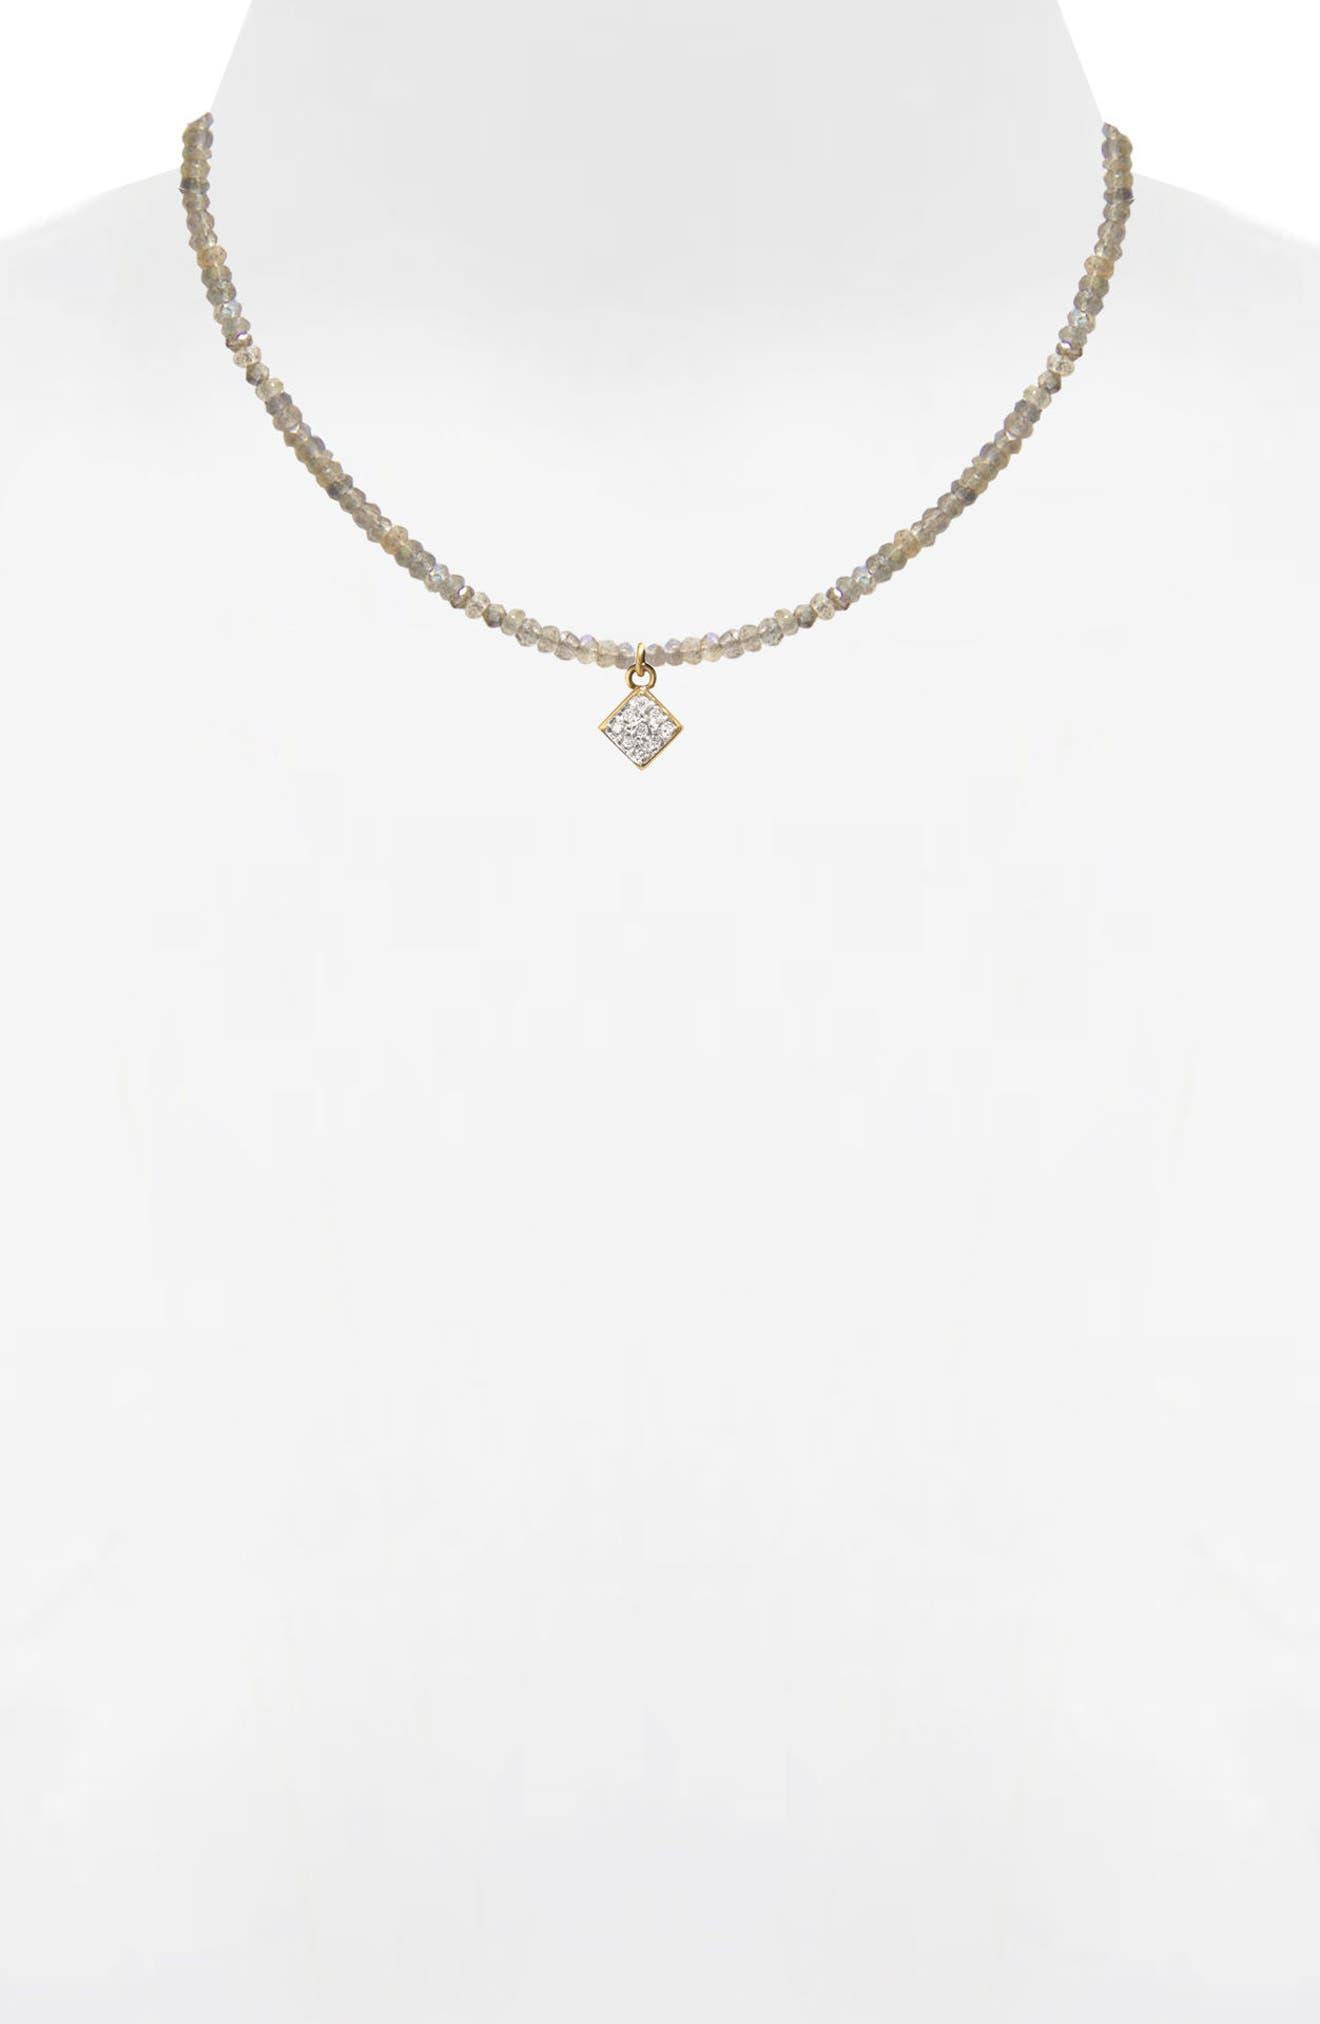 Jane Basch Diamond Charm Pendant Necklace,                             Alternate thumbnail 2, color,                             Labradorite